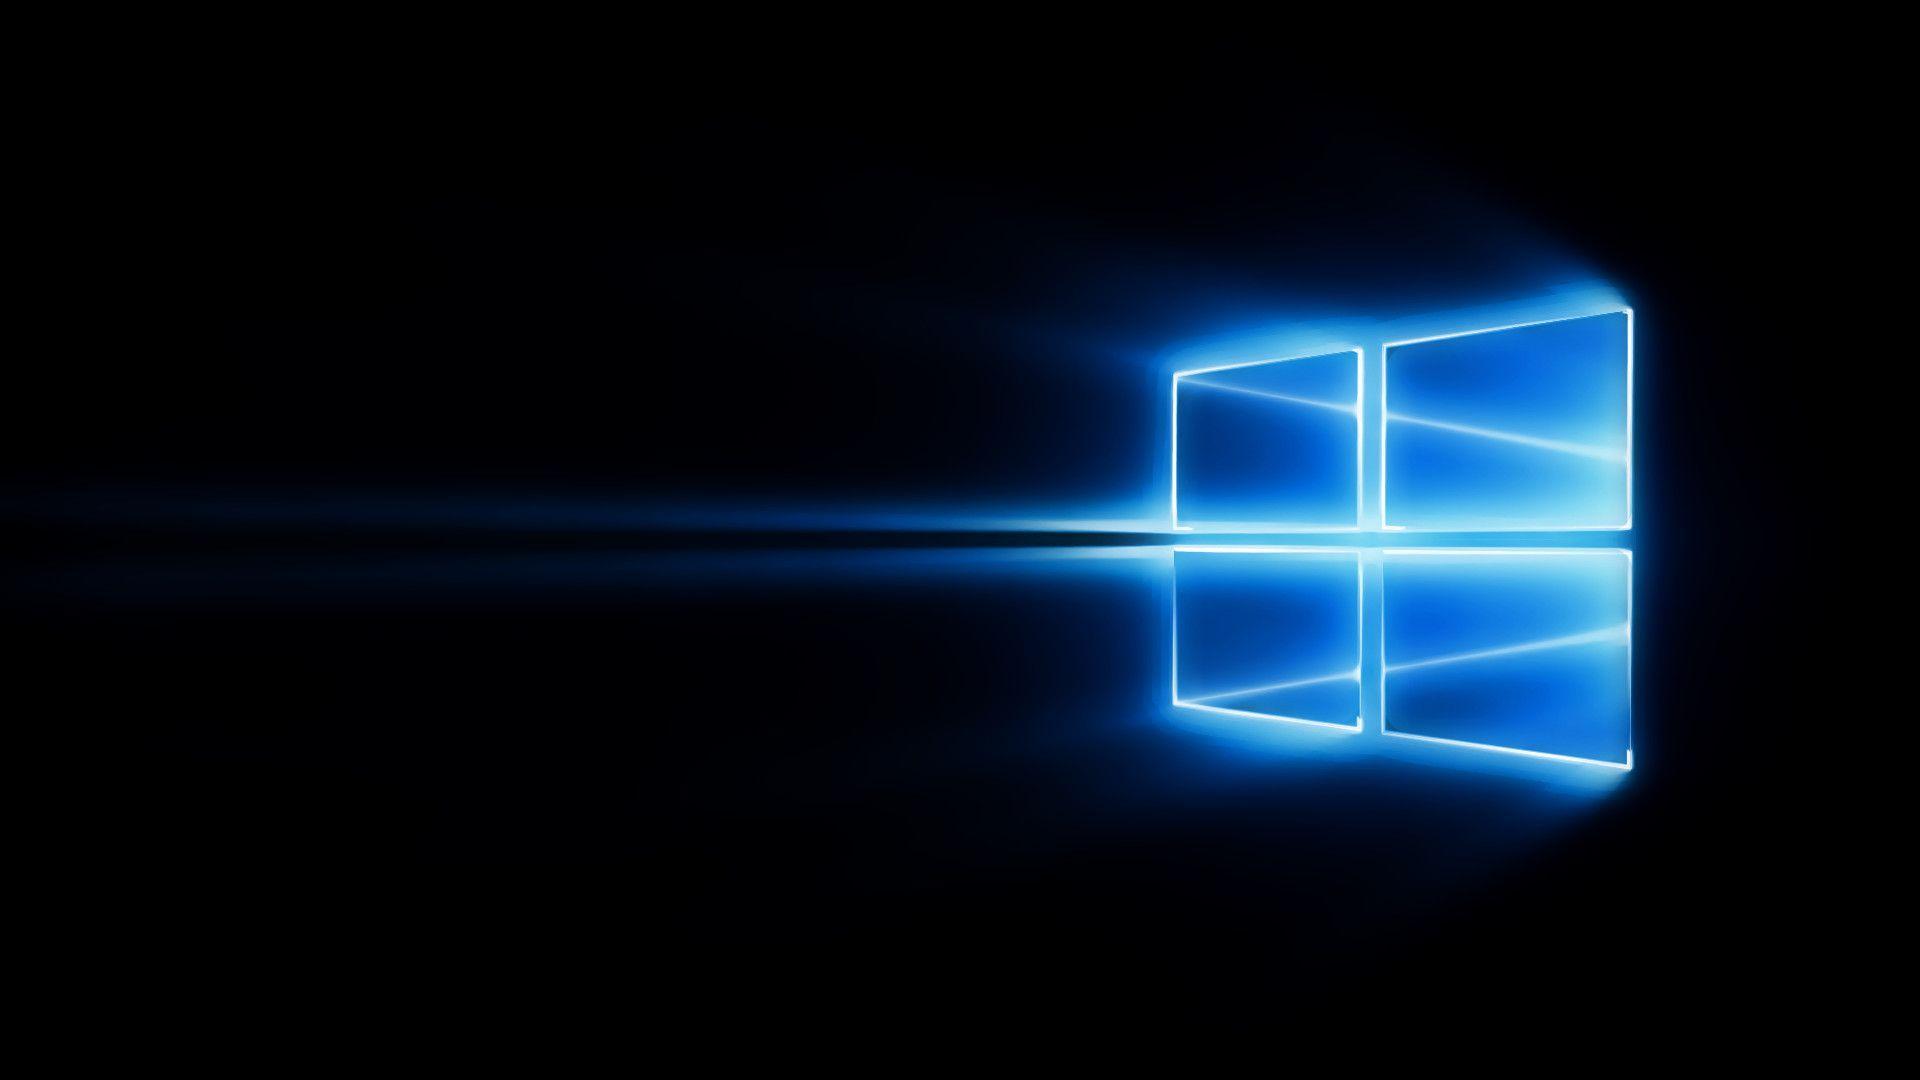 Windows 10 Black Wallpapers Top Free Windows 10 Black Backgrounds Wallpaperaccess